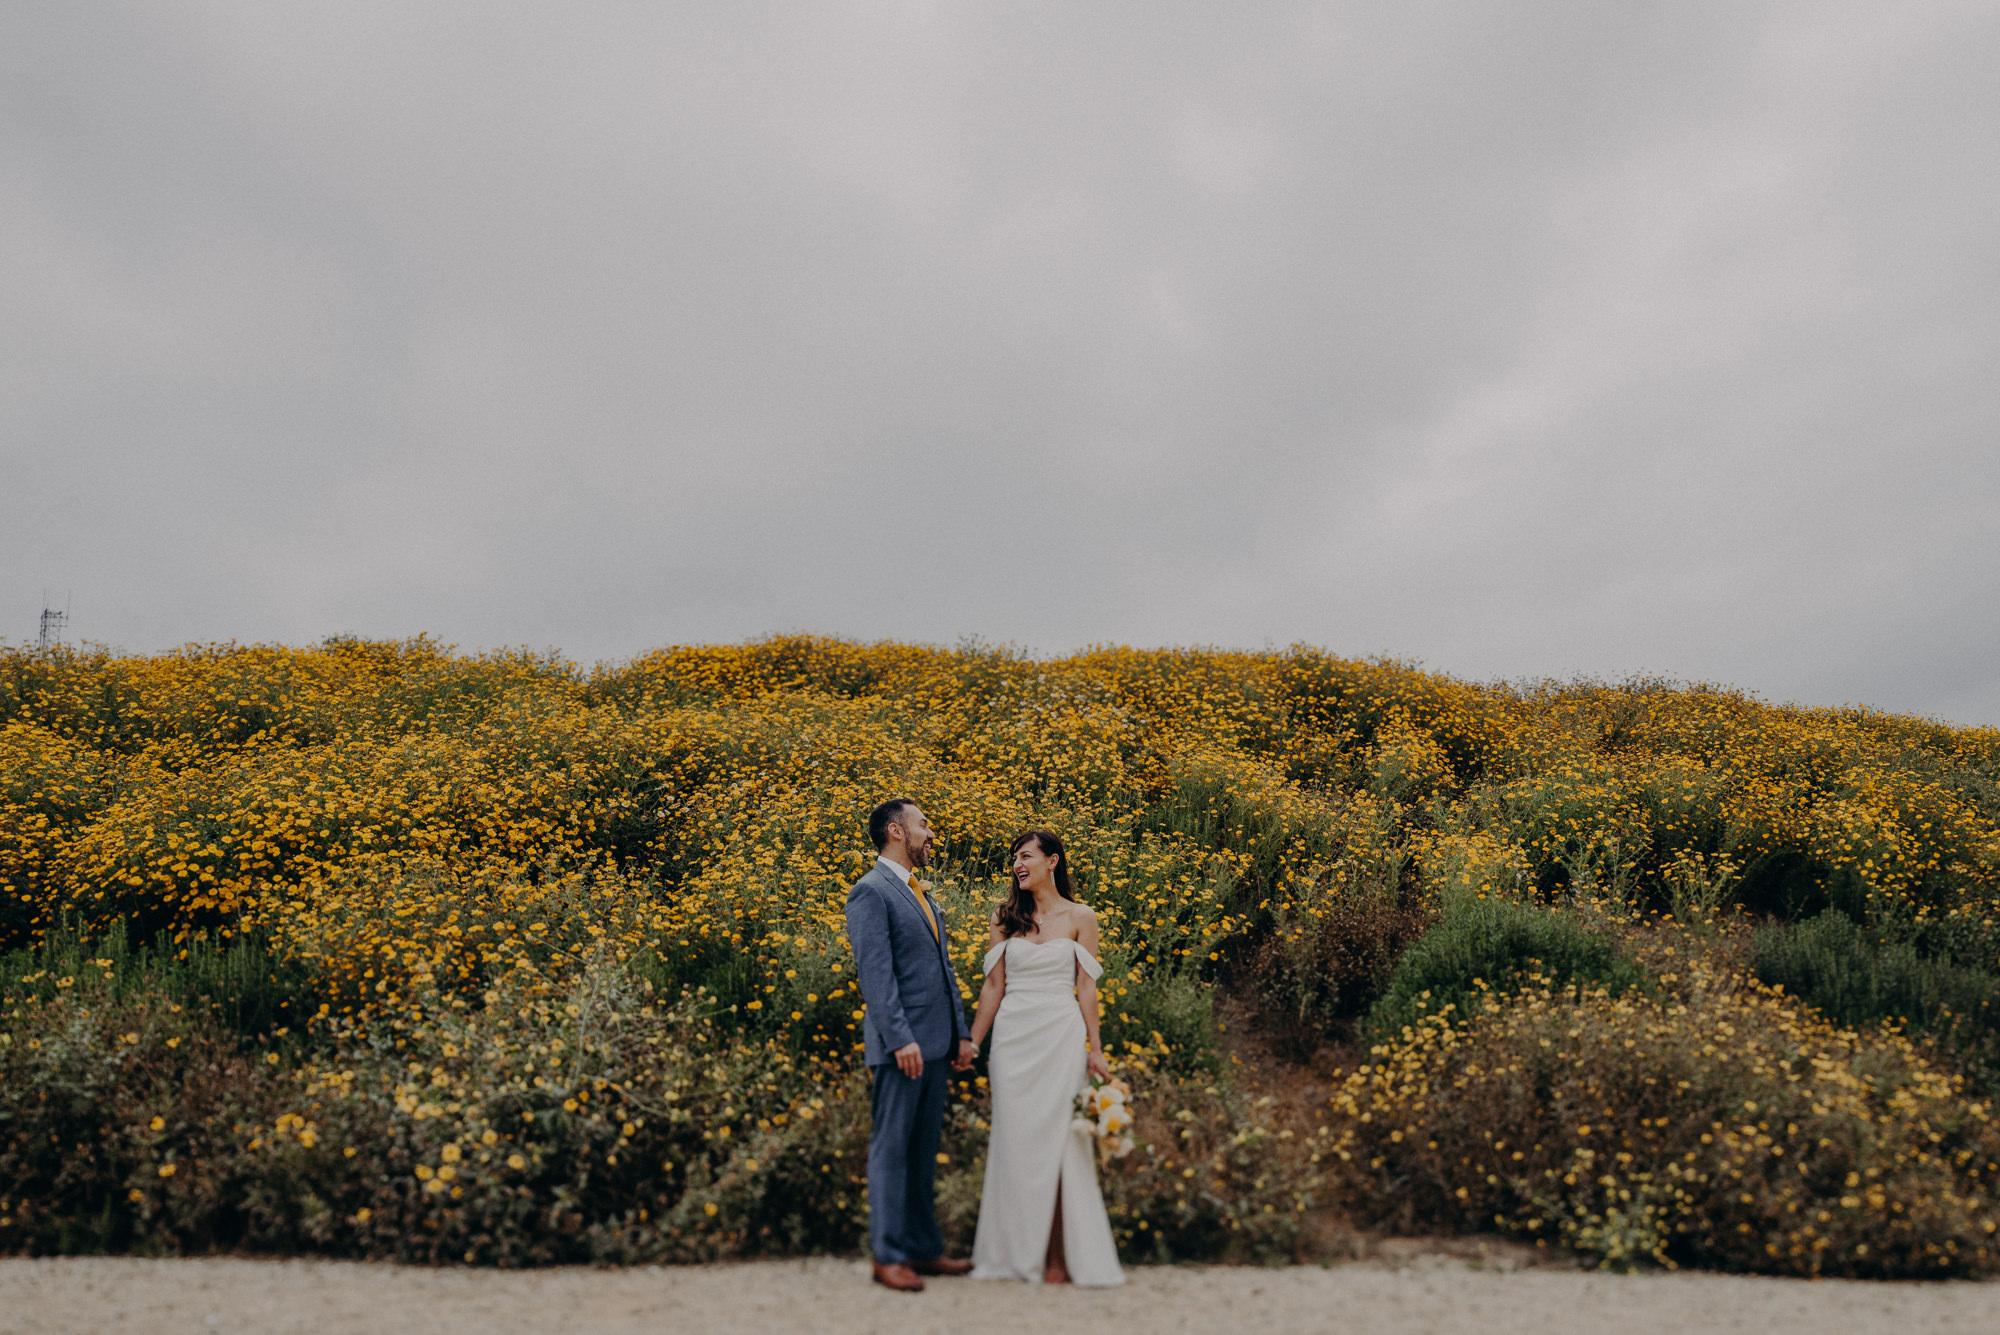 elopement photographer in los angeles - la wedding photographer - isaiahandtaylor.com-017.jpg